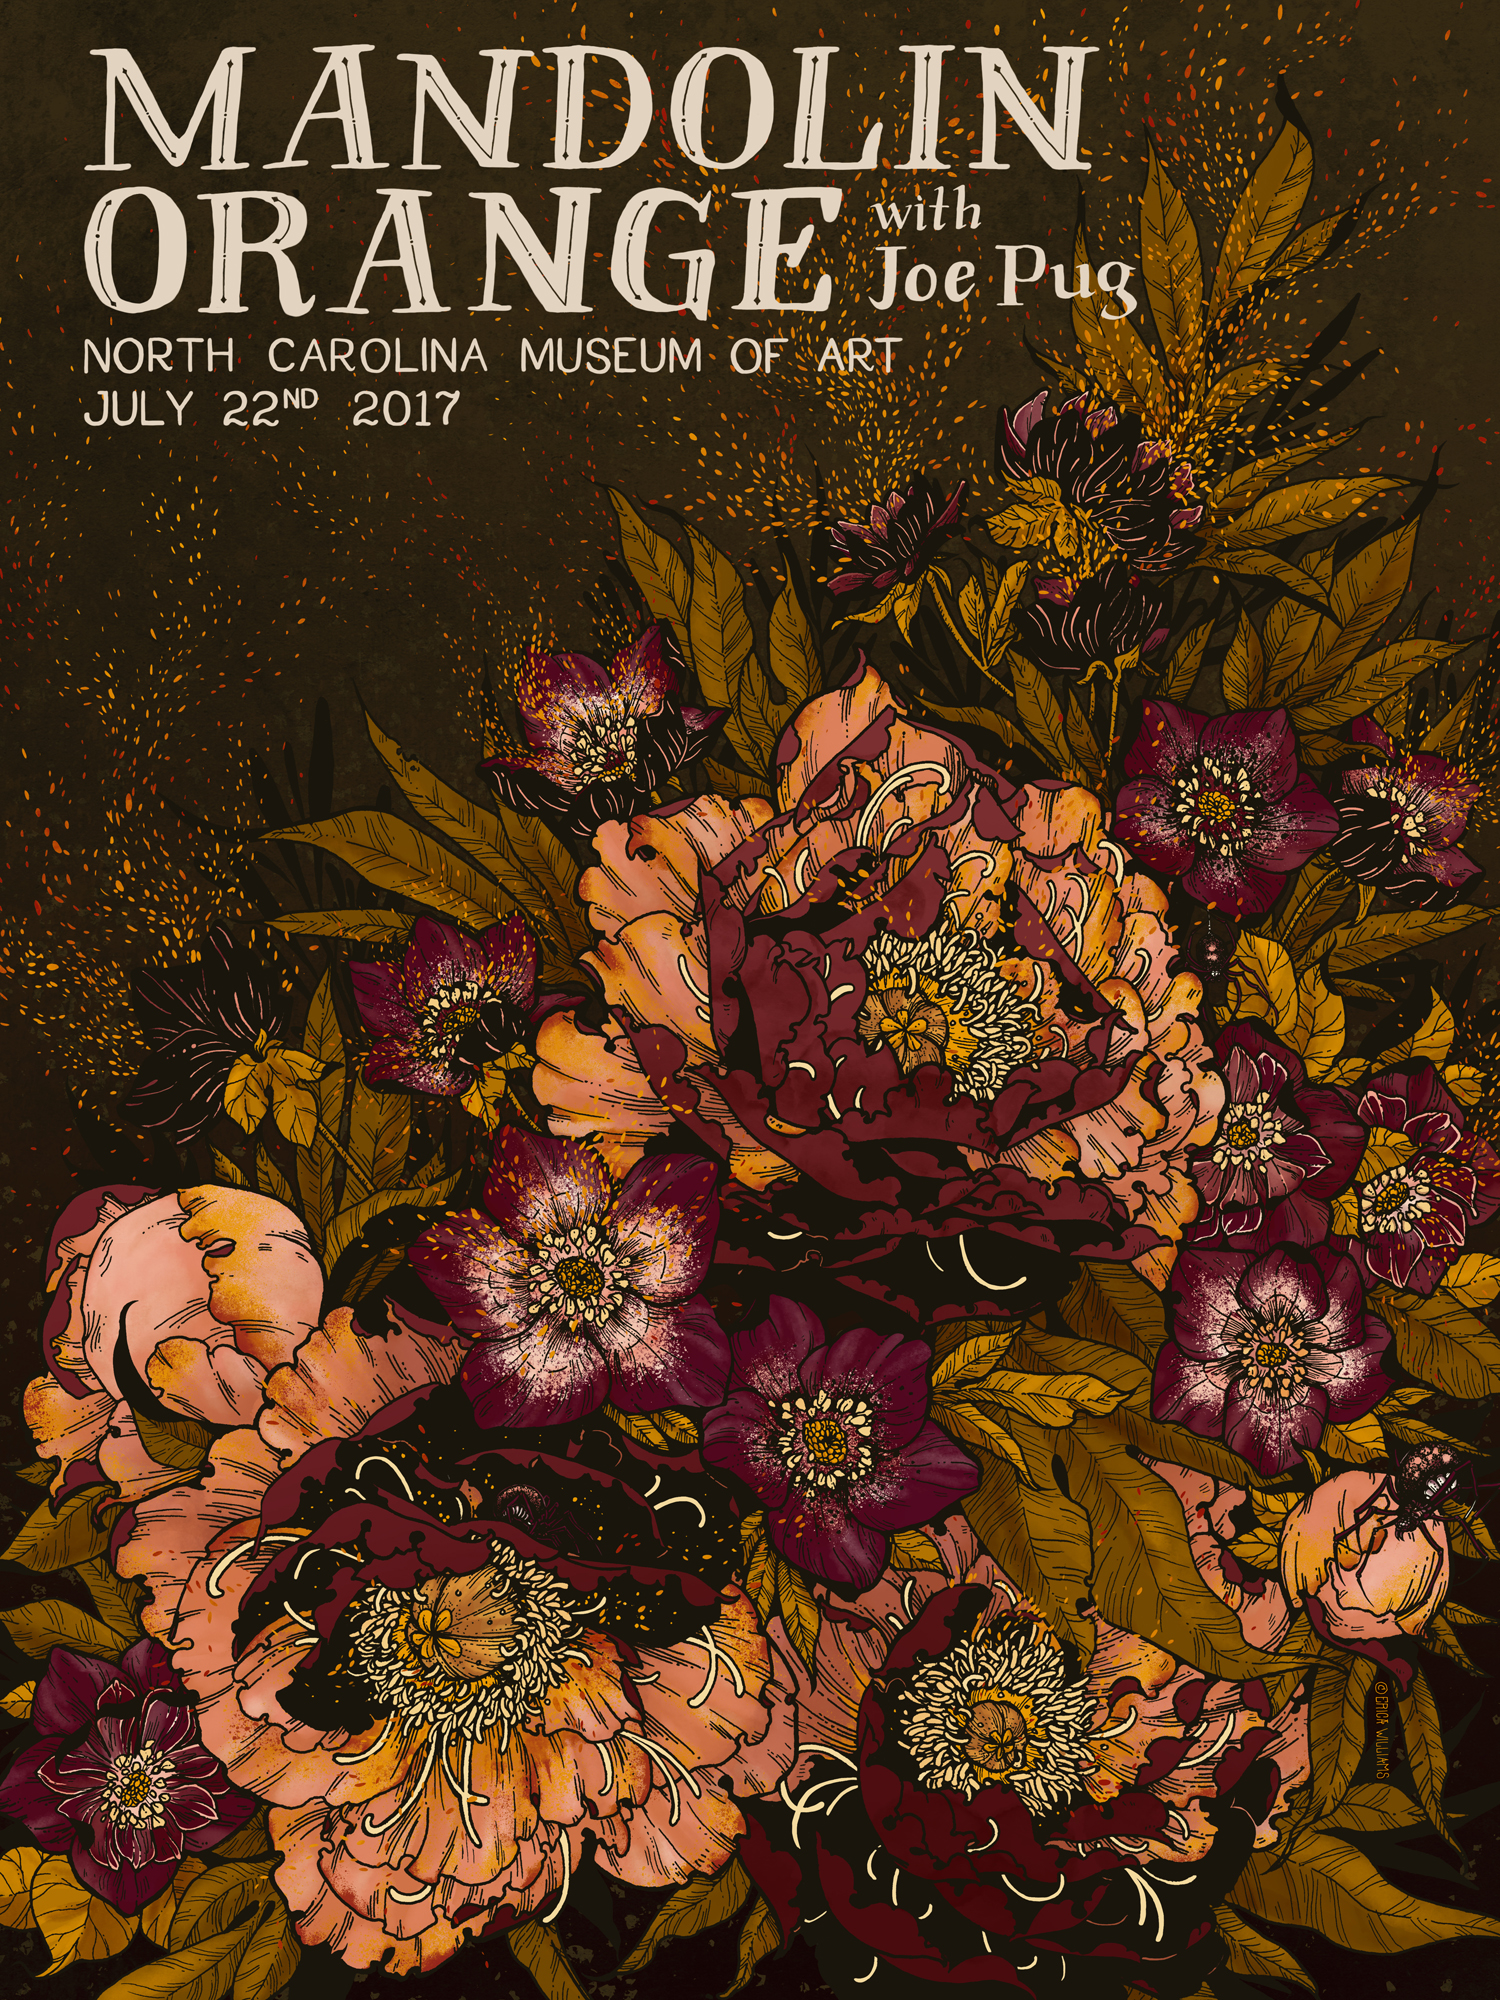 Mandolin Orange - North Carolina Museum of Art - Screen Print Poster - Erica Williams.jpg